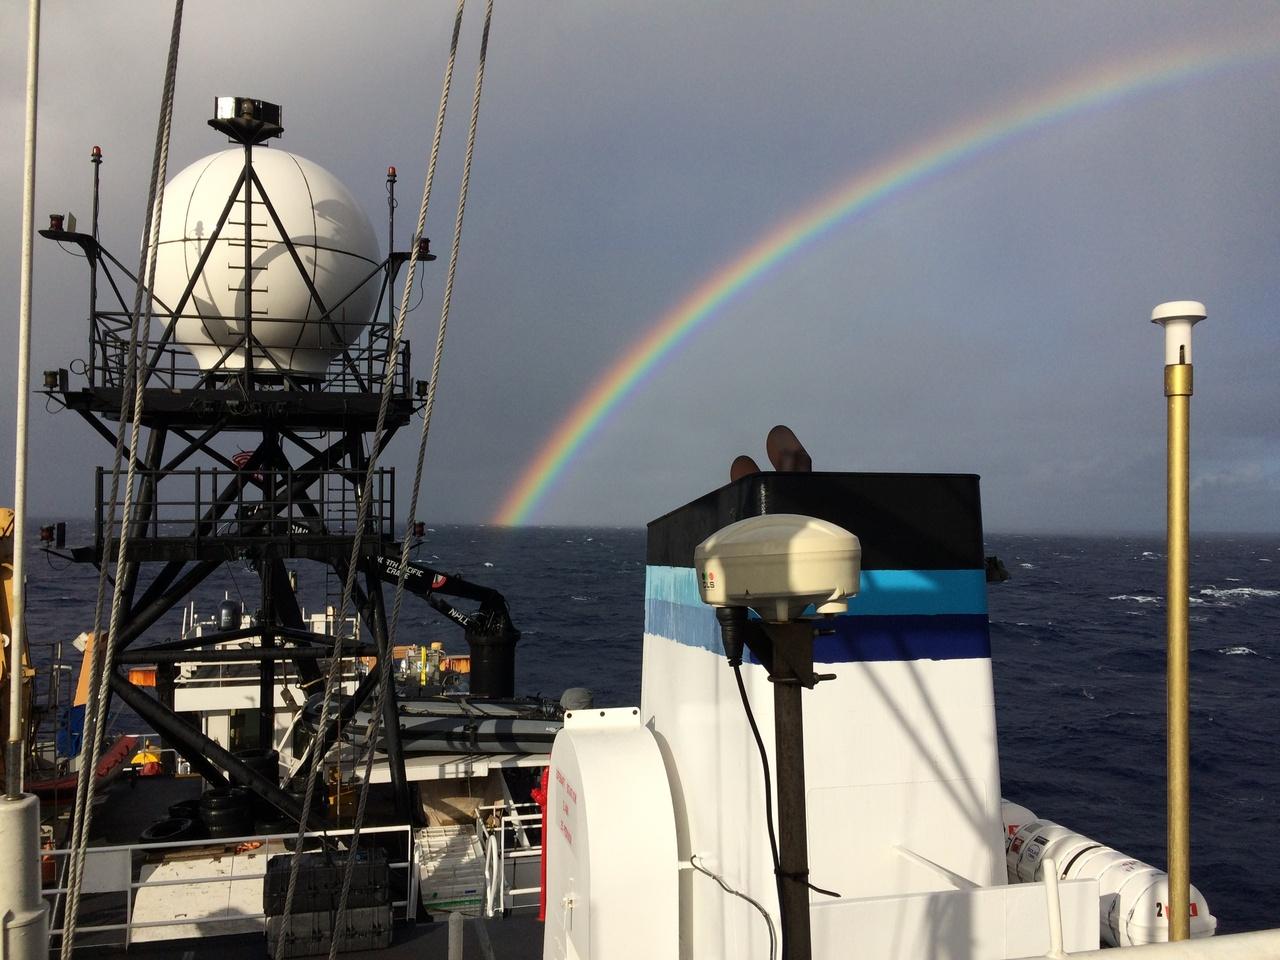 Beautiful Hawaiian rainbow after passing through a rain squall. Photo: NOAA Fisheries/Suzanne Yin.